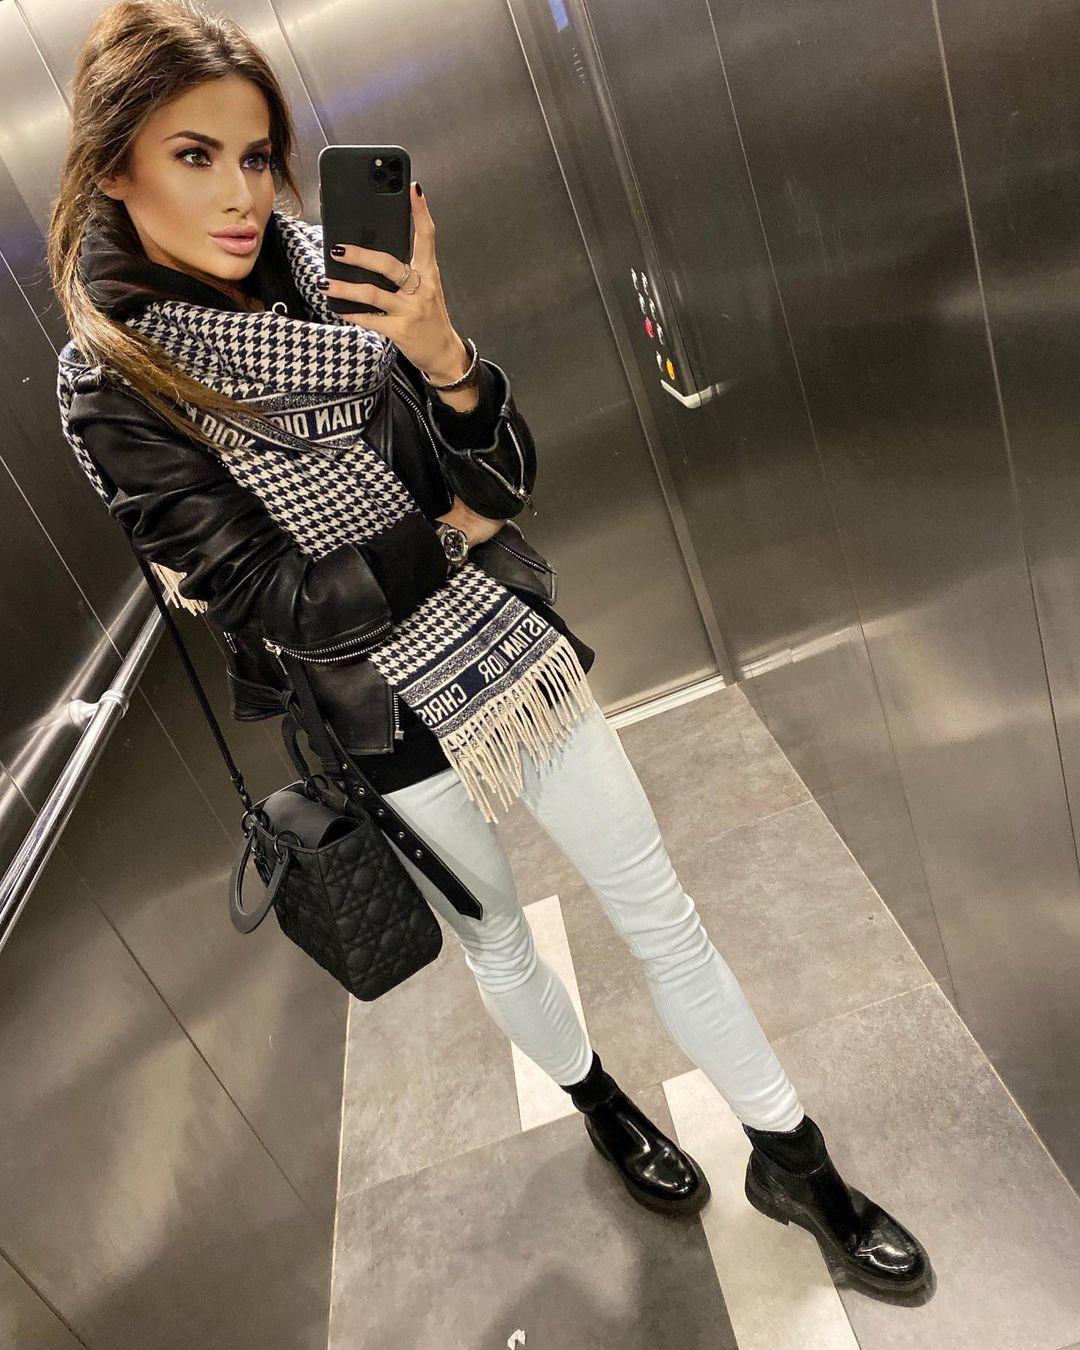 Paulina-Mai-Wallpapers-Insta-Fit-Bio-7